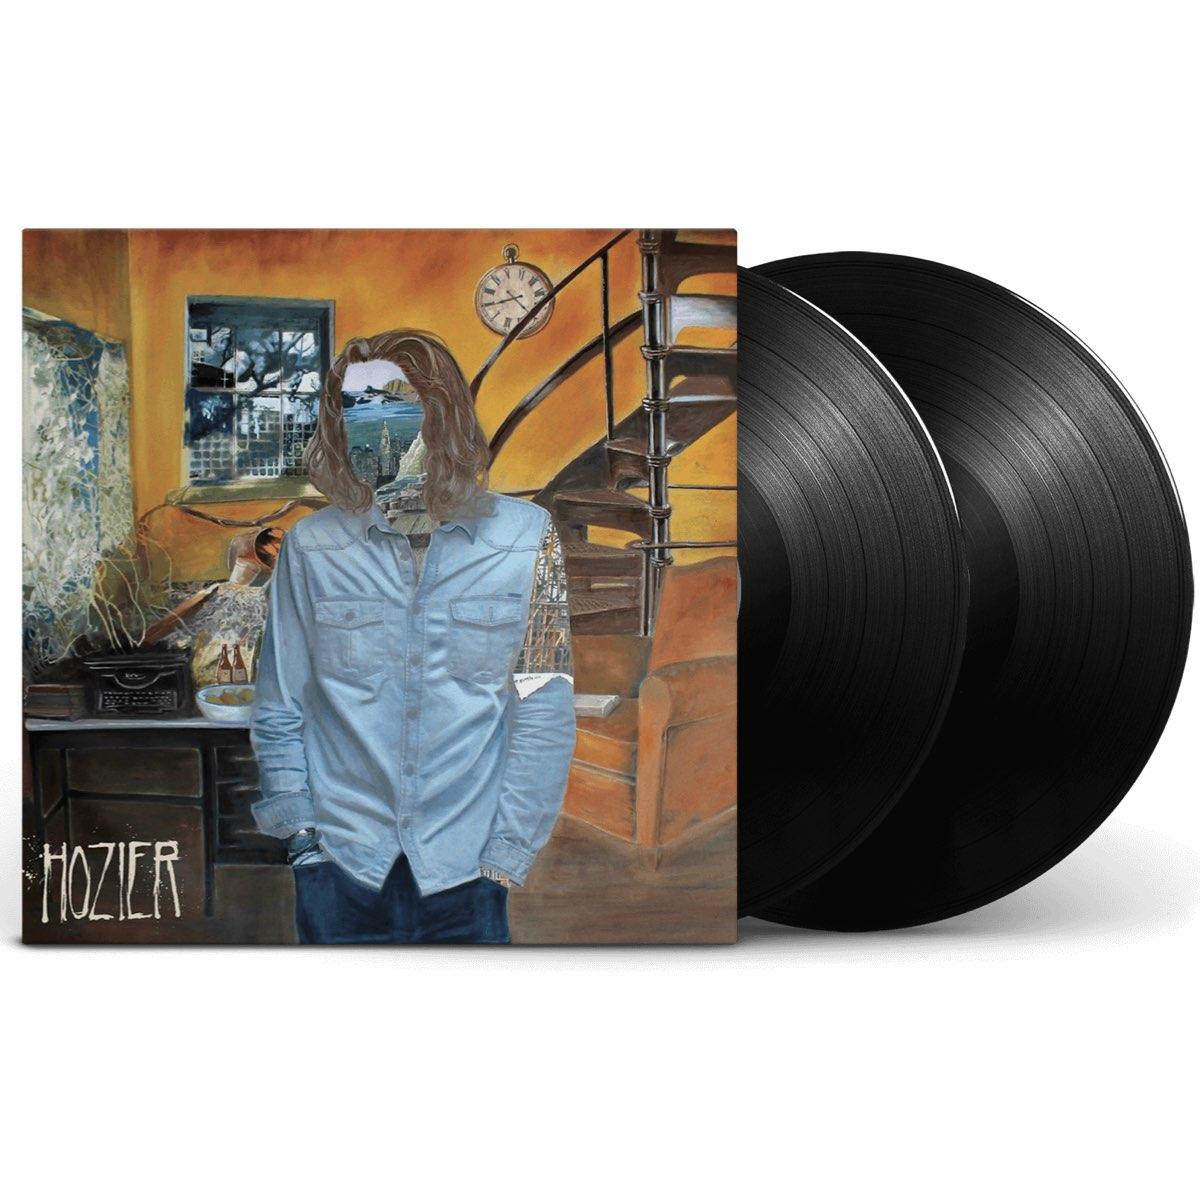 Hozier - Hozier [Black Vinyl - Duplo]